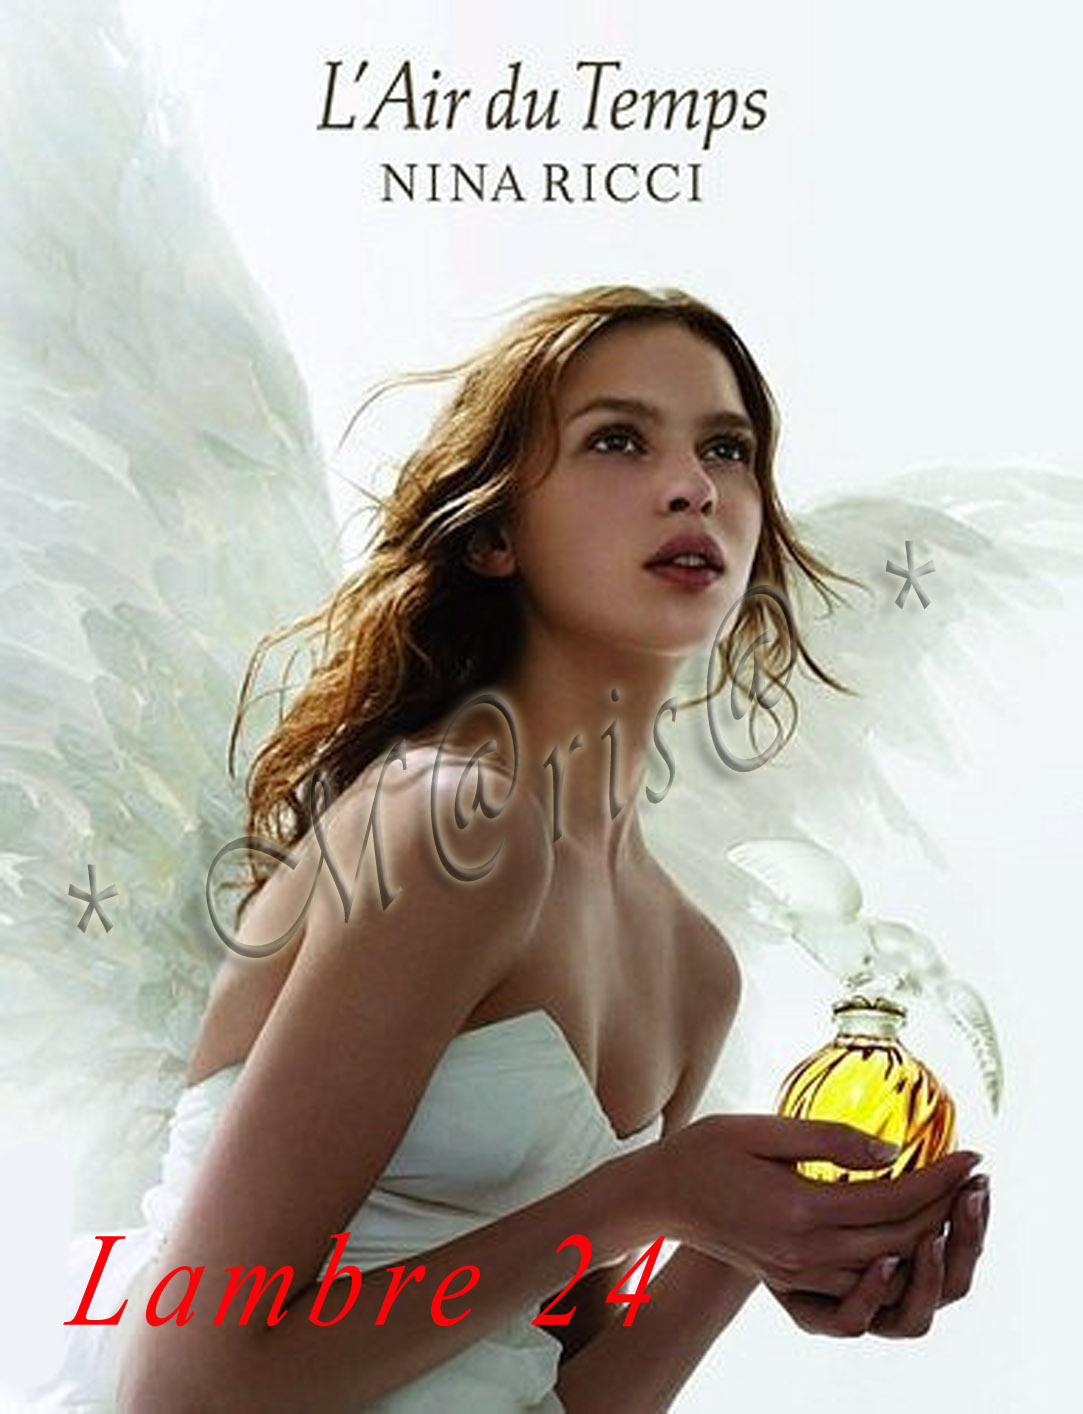 Реклама нина ричи 15 фотография